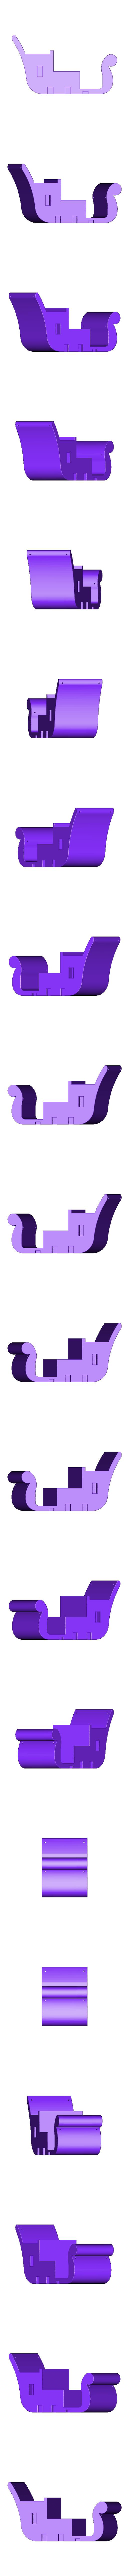 SLEIGH MIDDLE.stl Download free STL file Santa Sleigh • Object to 3D print, 3DPrintersaur